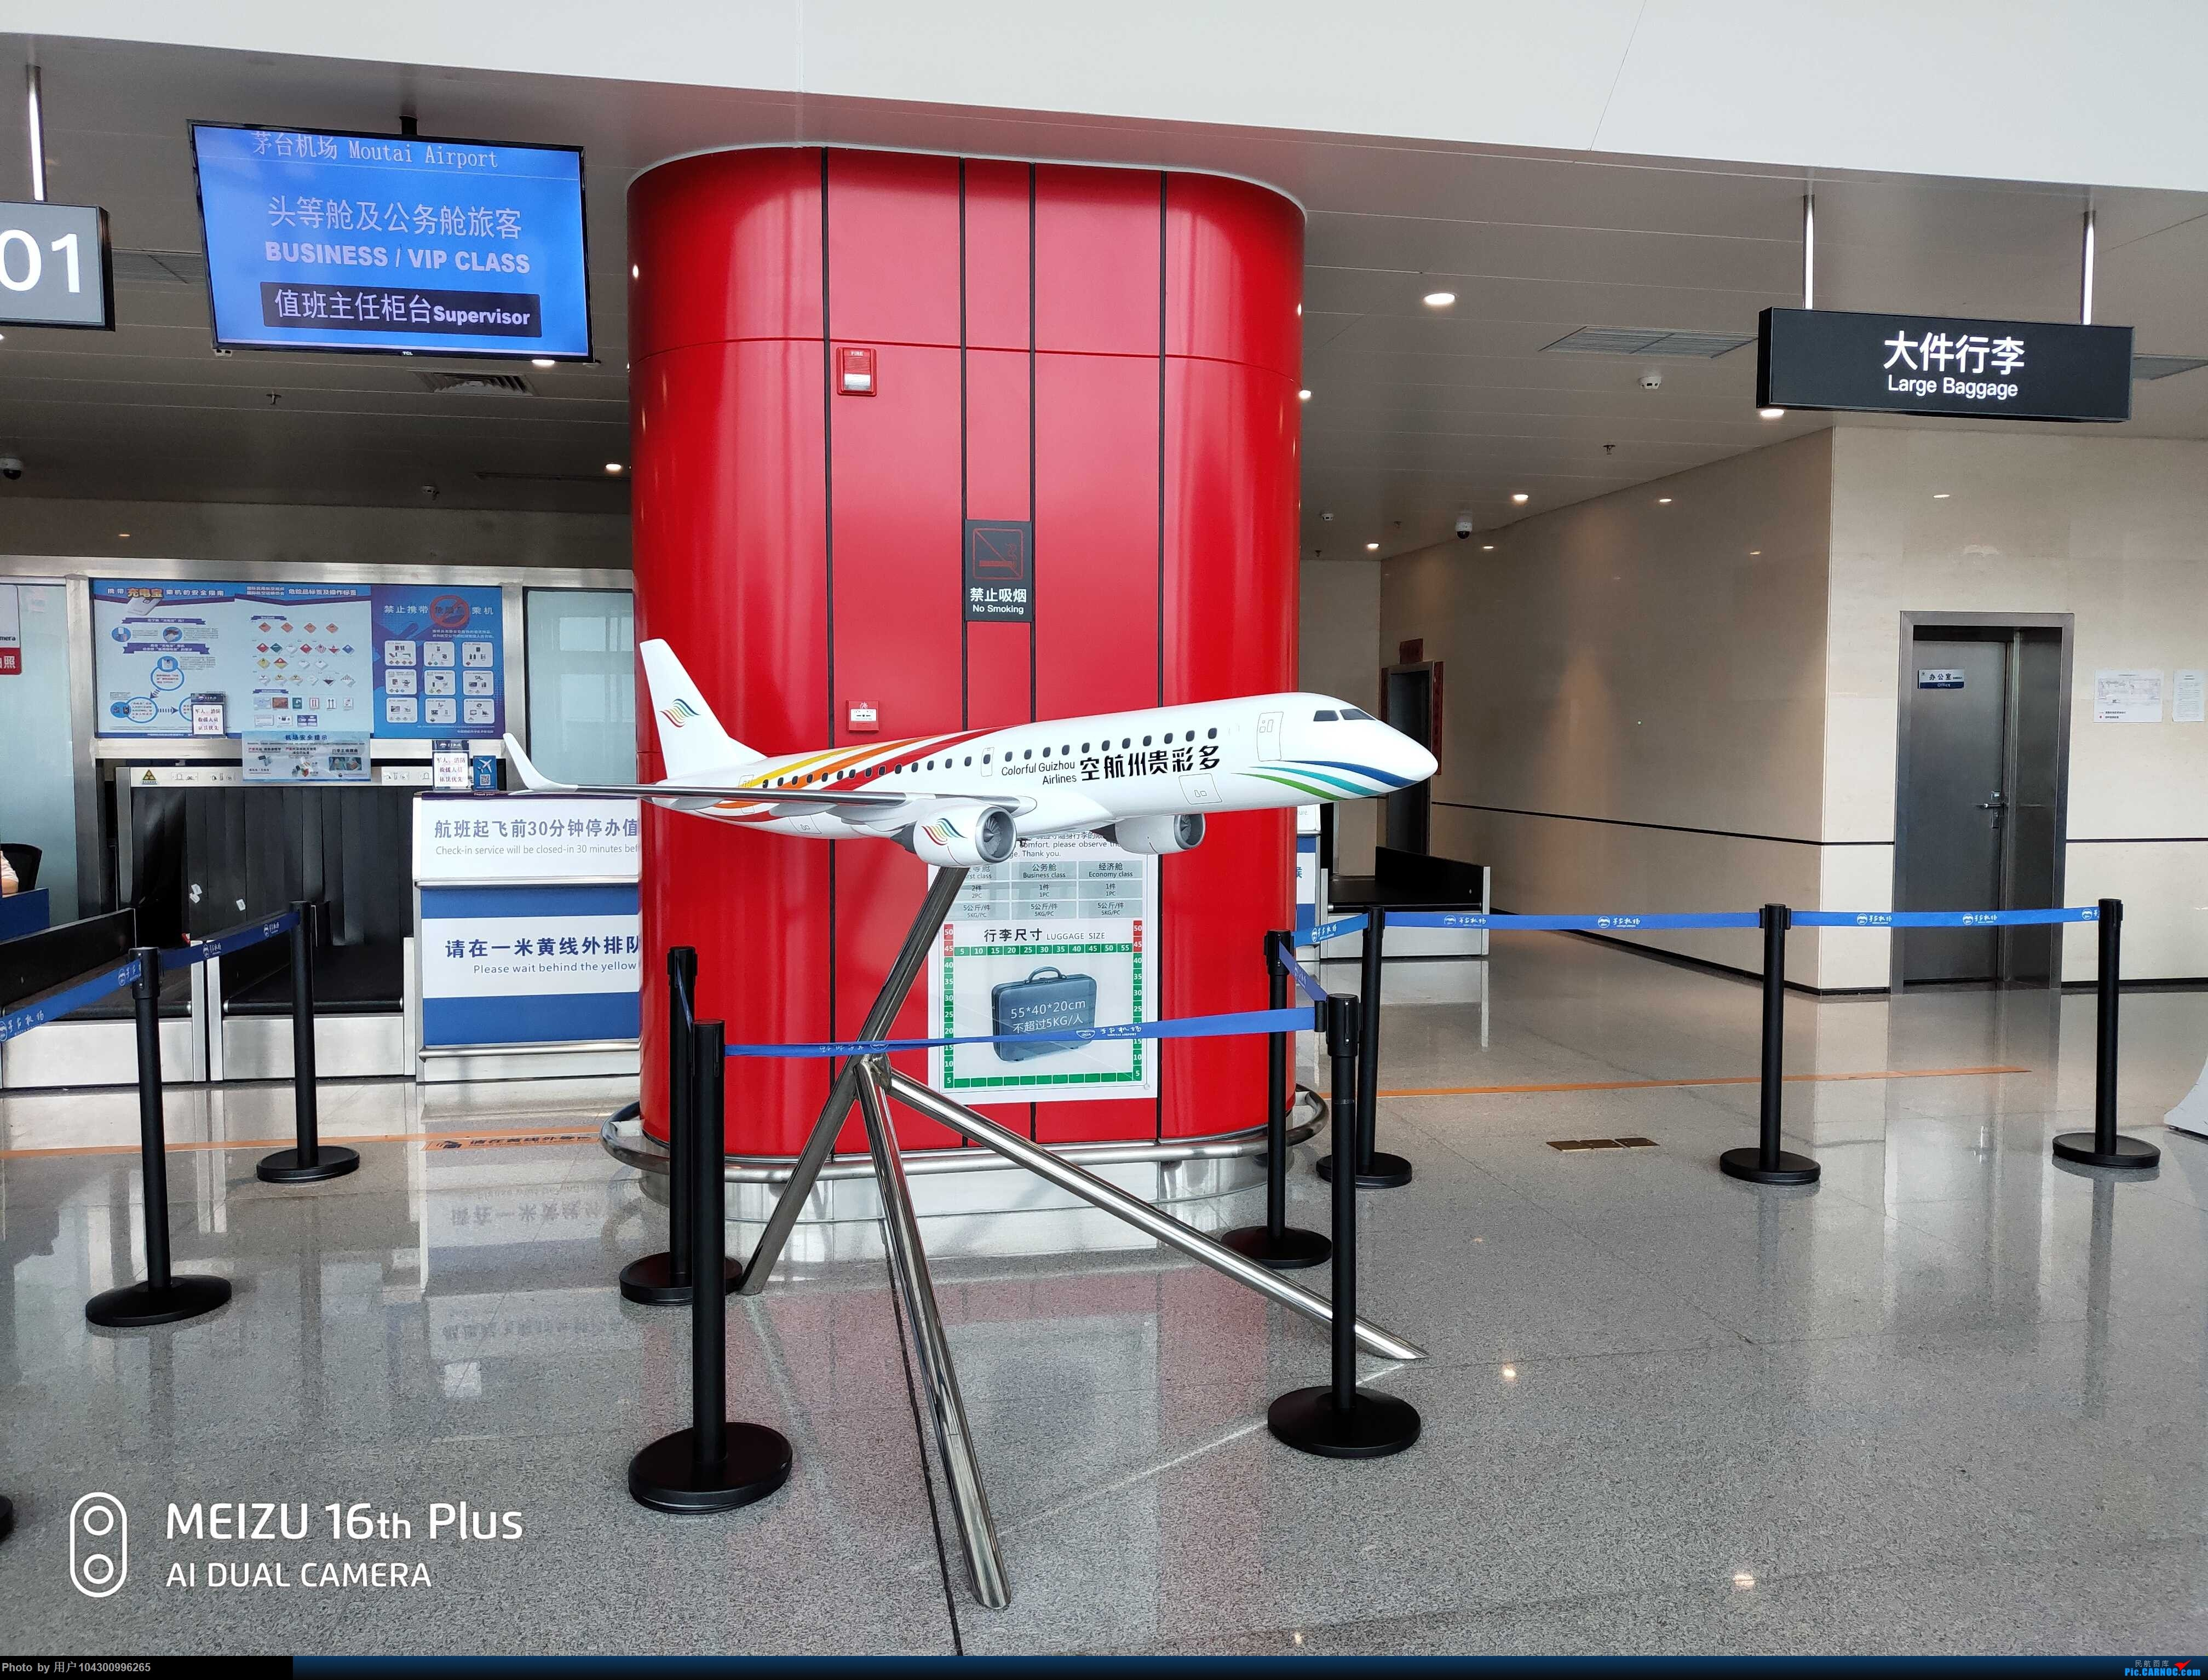 Re:[原创][DM哥飞行游记]-多彩贵州航空贵阳-茅台当日往返    中国遵义茅台机场